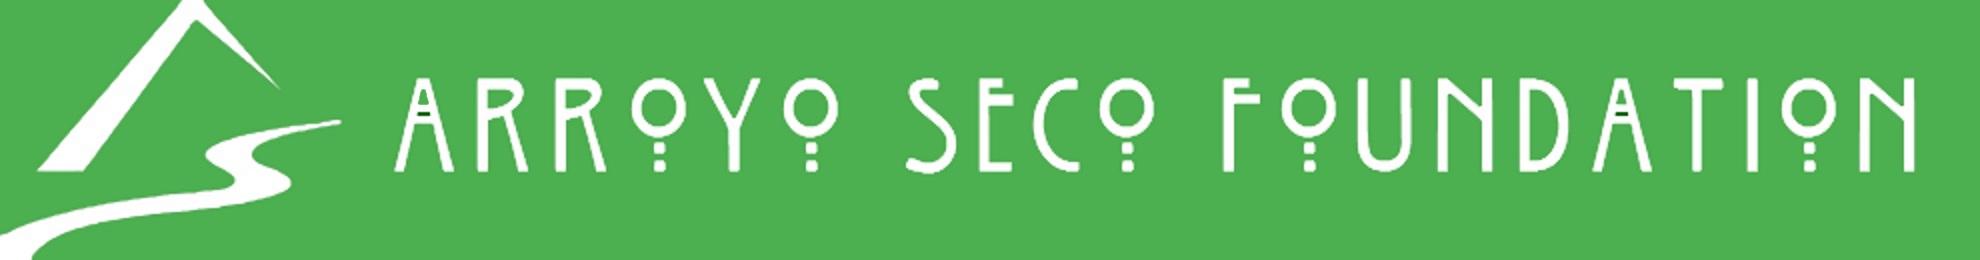 Arroyo Seco Foundation